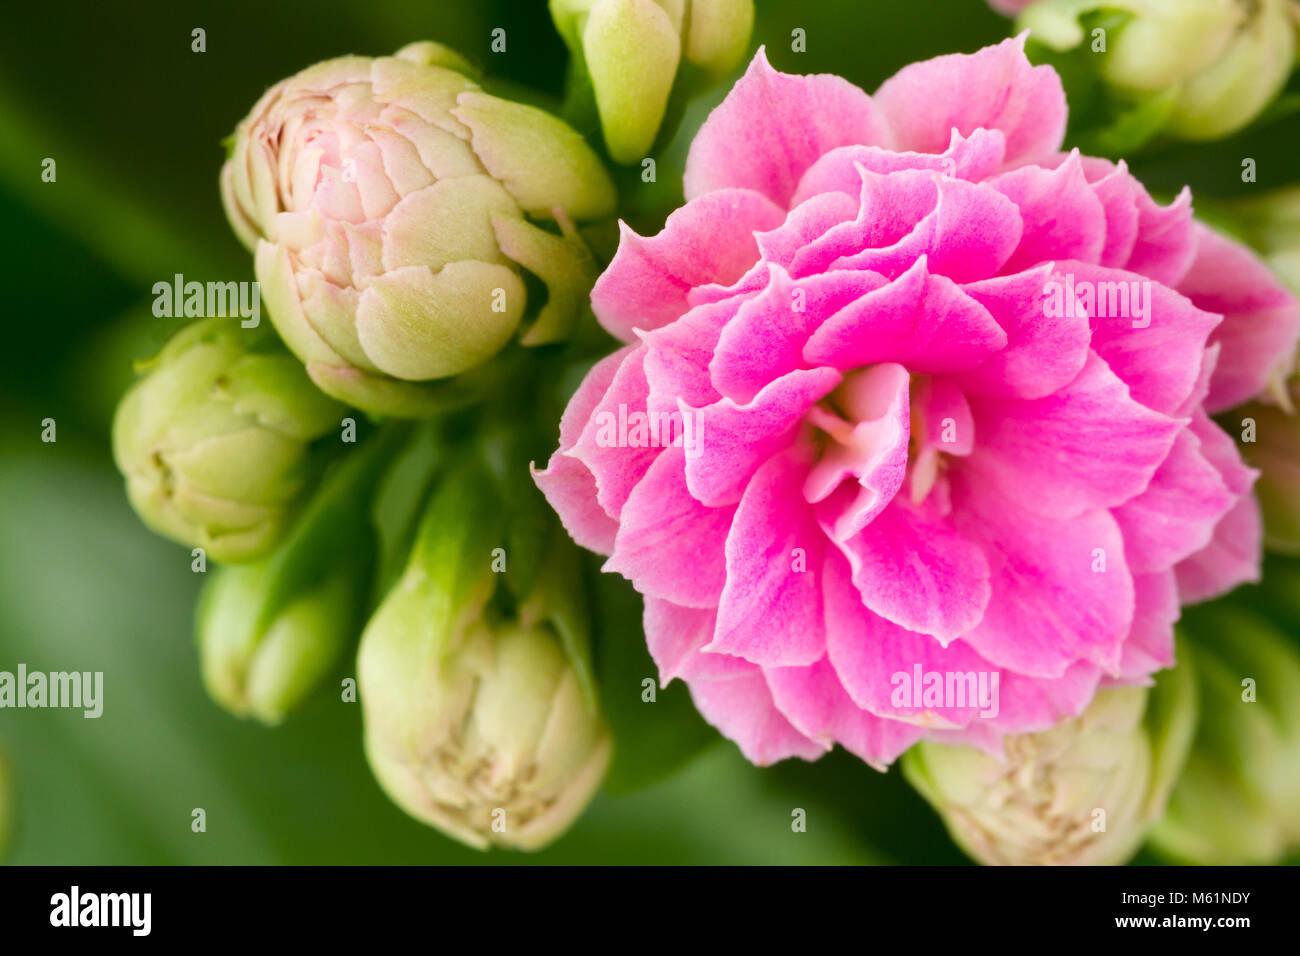 Close up of a Kalanchoe Blossfeldiana (flaming katy) house plant flower - Stock Image